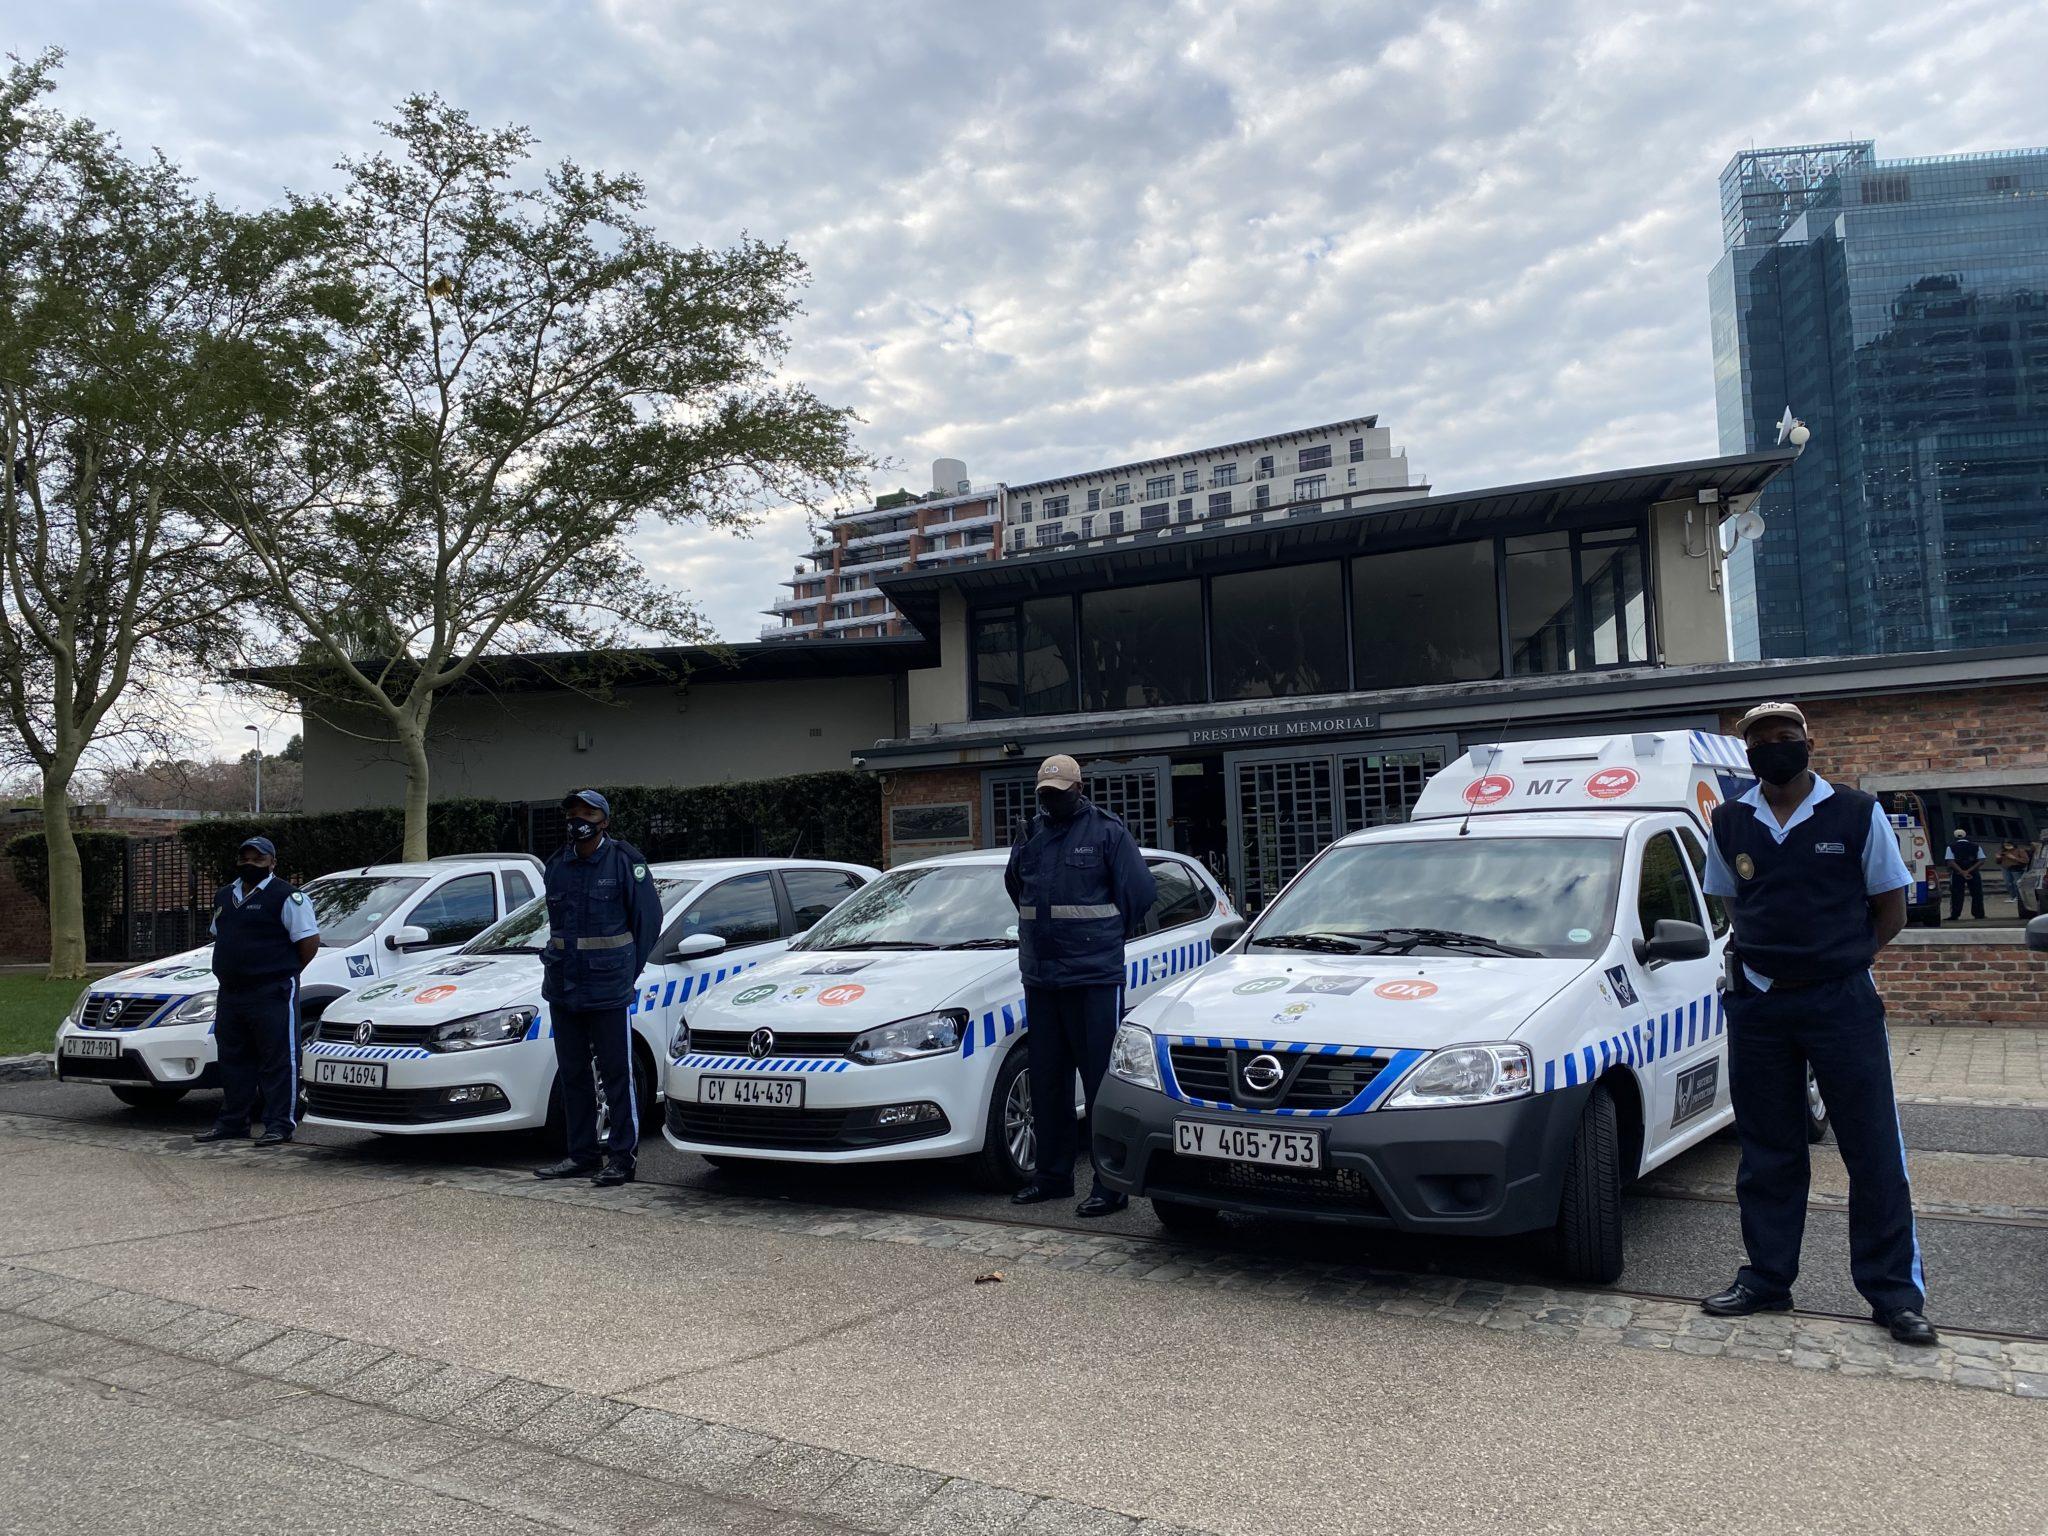 Onward and upward with new patrol vehicles and dedicated senior patrollers